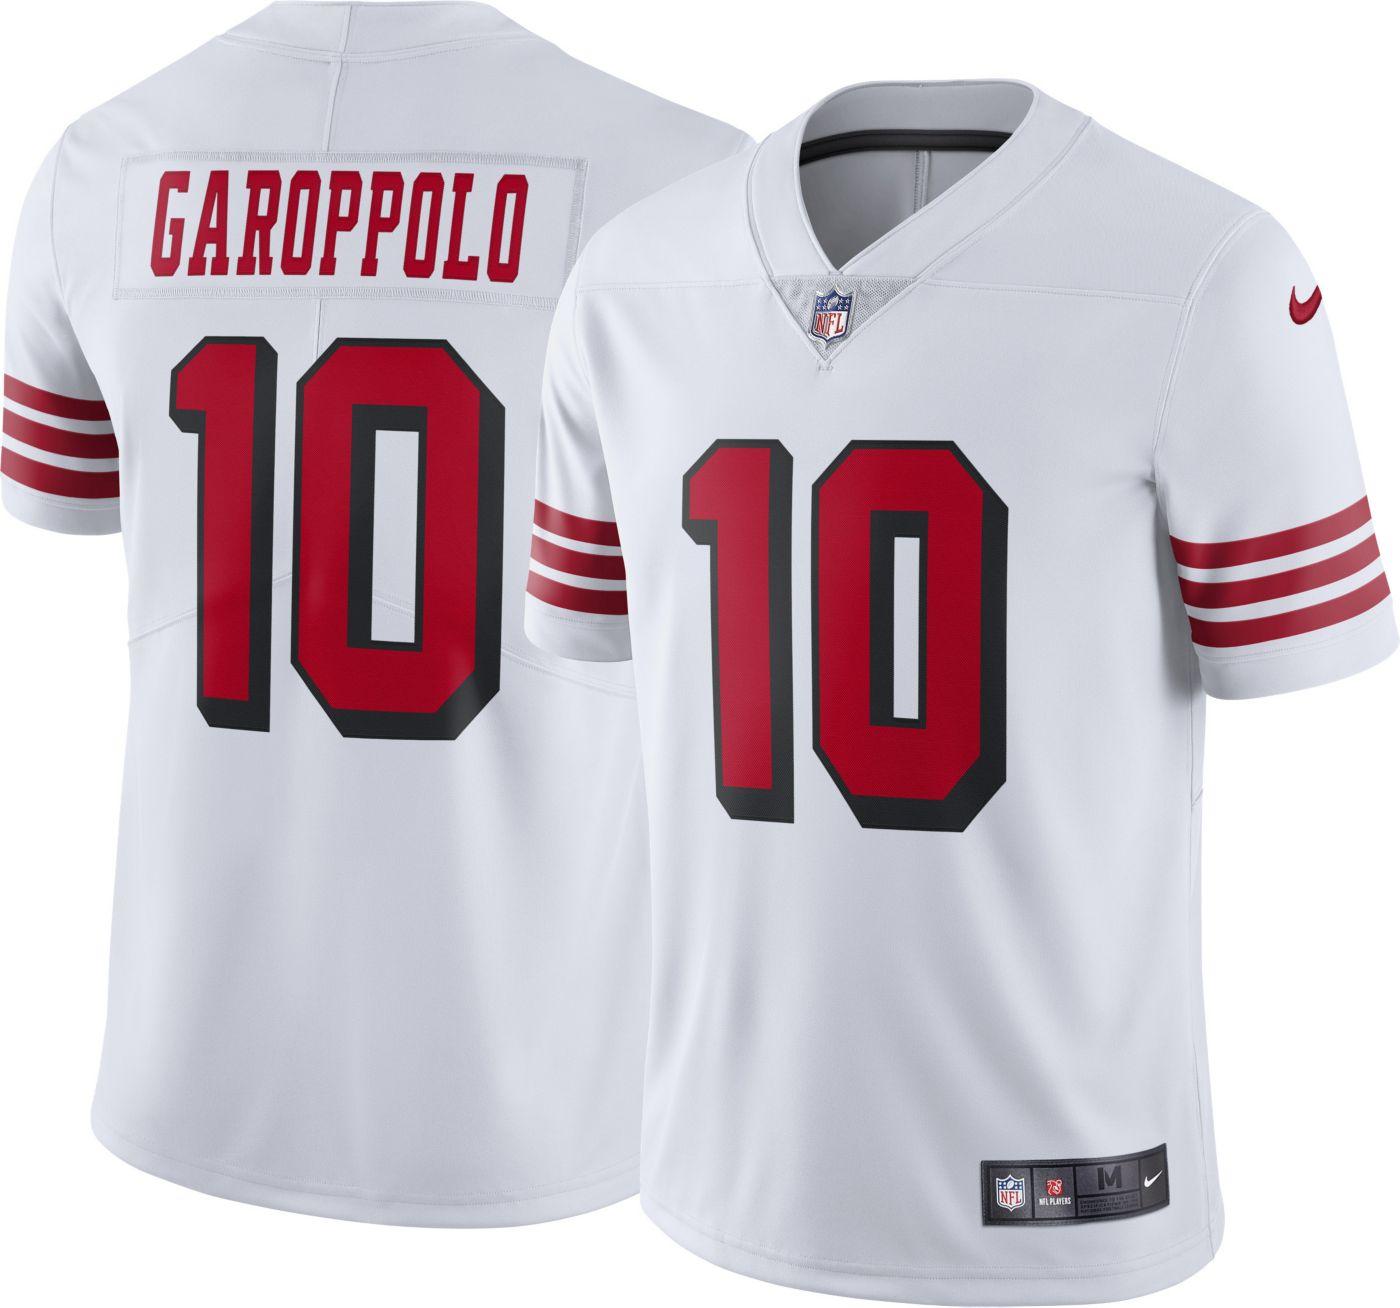 Nike Men's Color Rush Limited Jersey San Francisco 49ers Jimmy Garoppolo #10